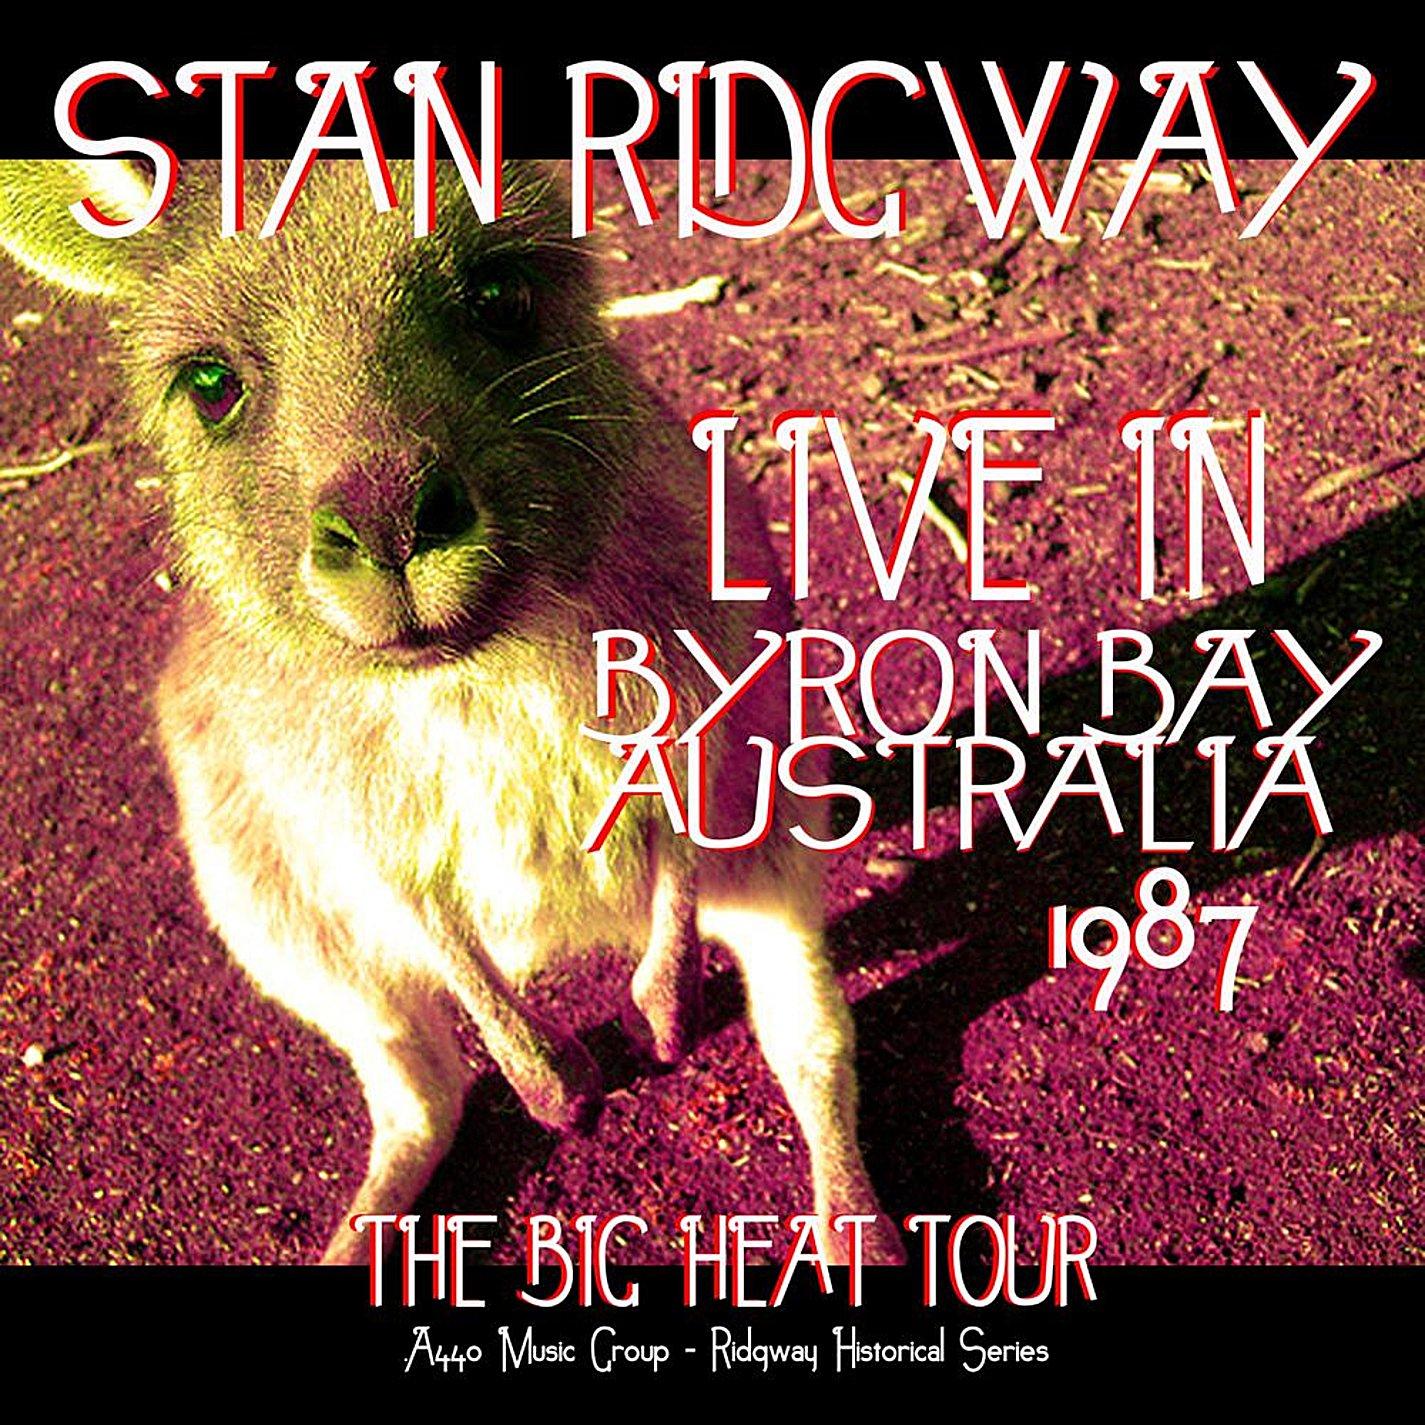 Live in Byron Bay Australia 1987